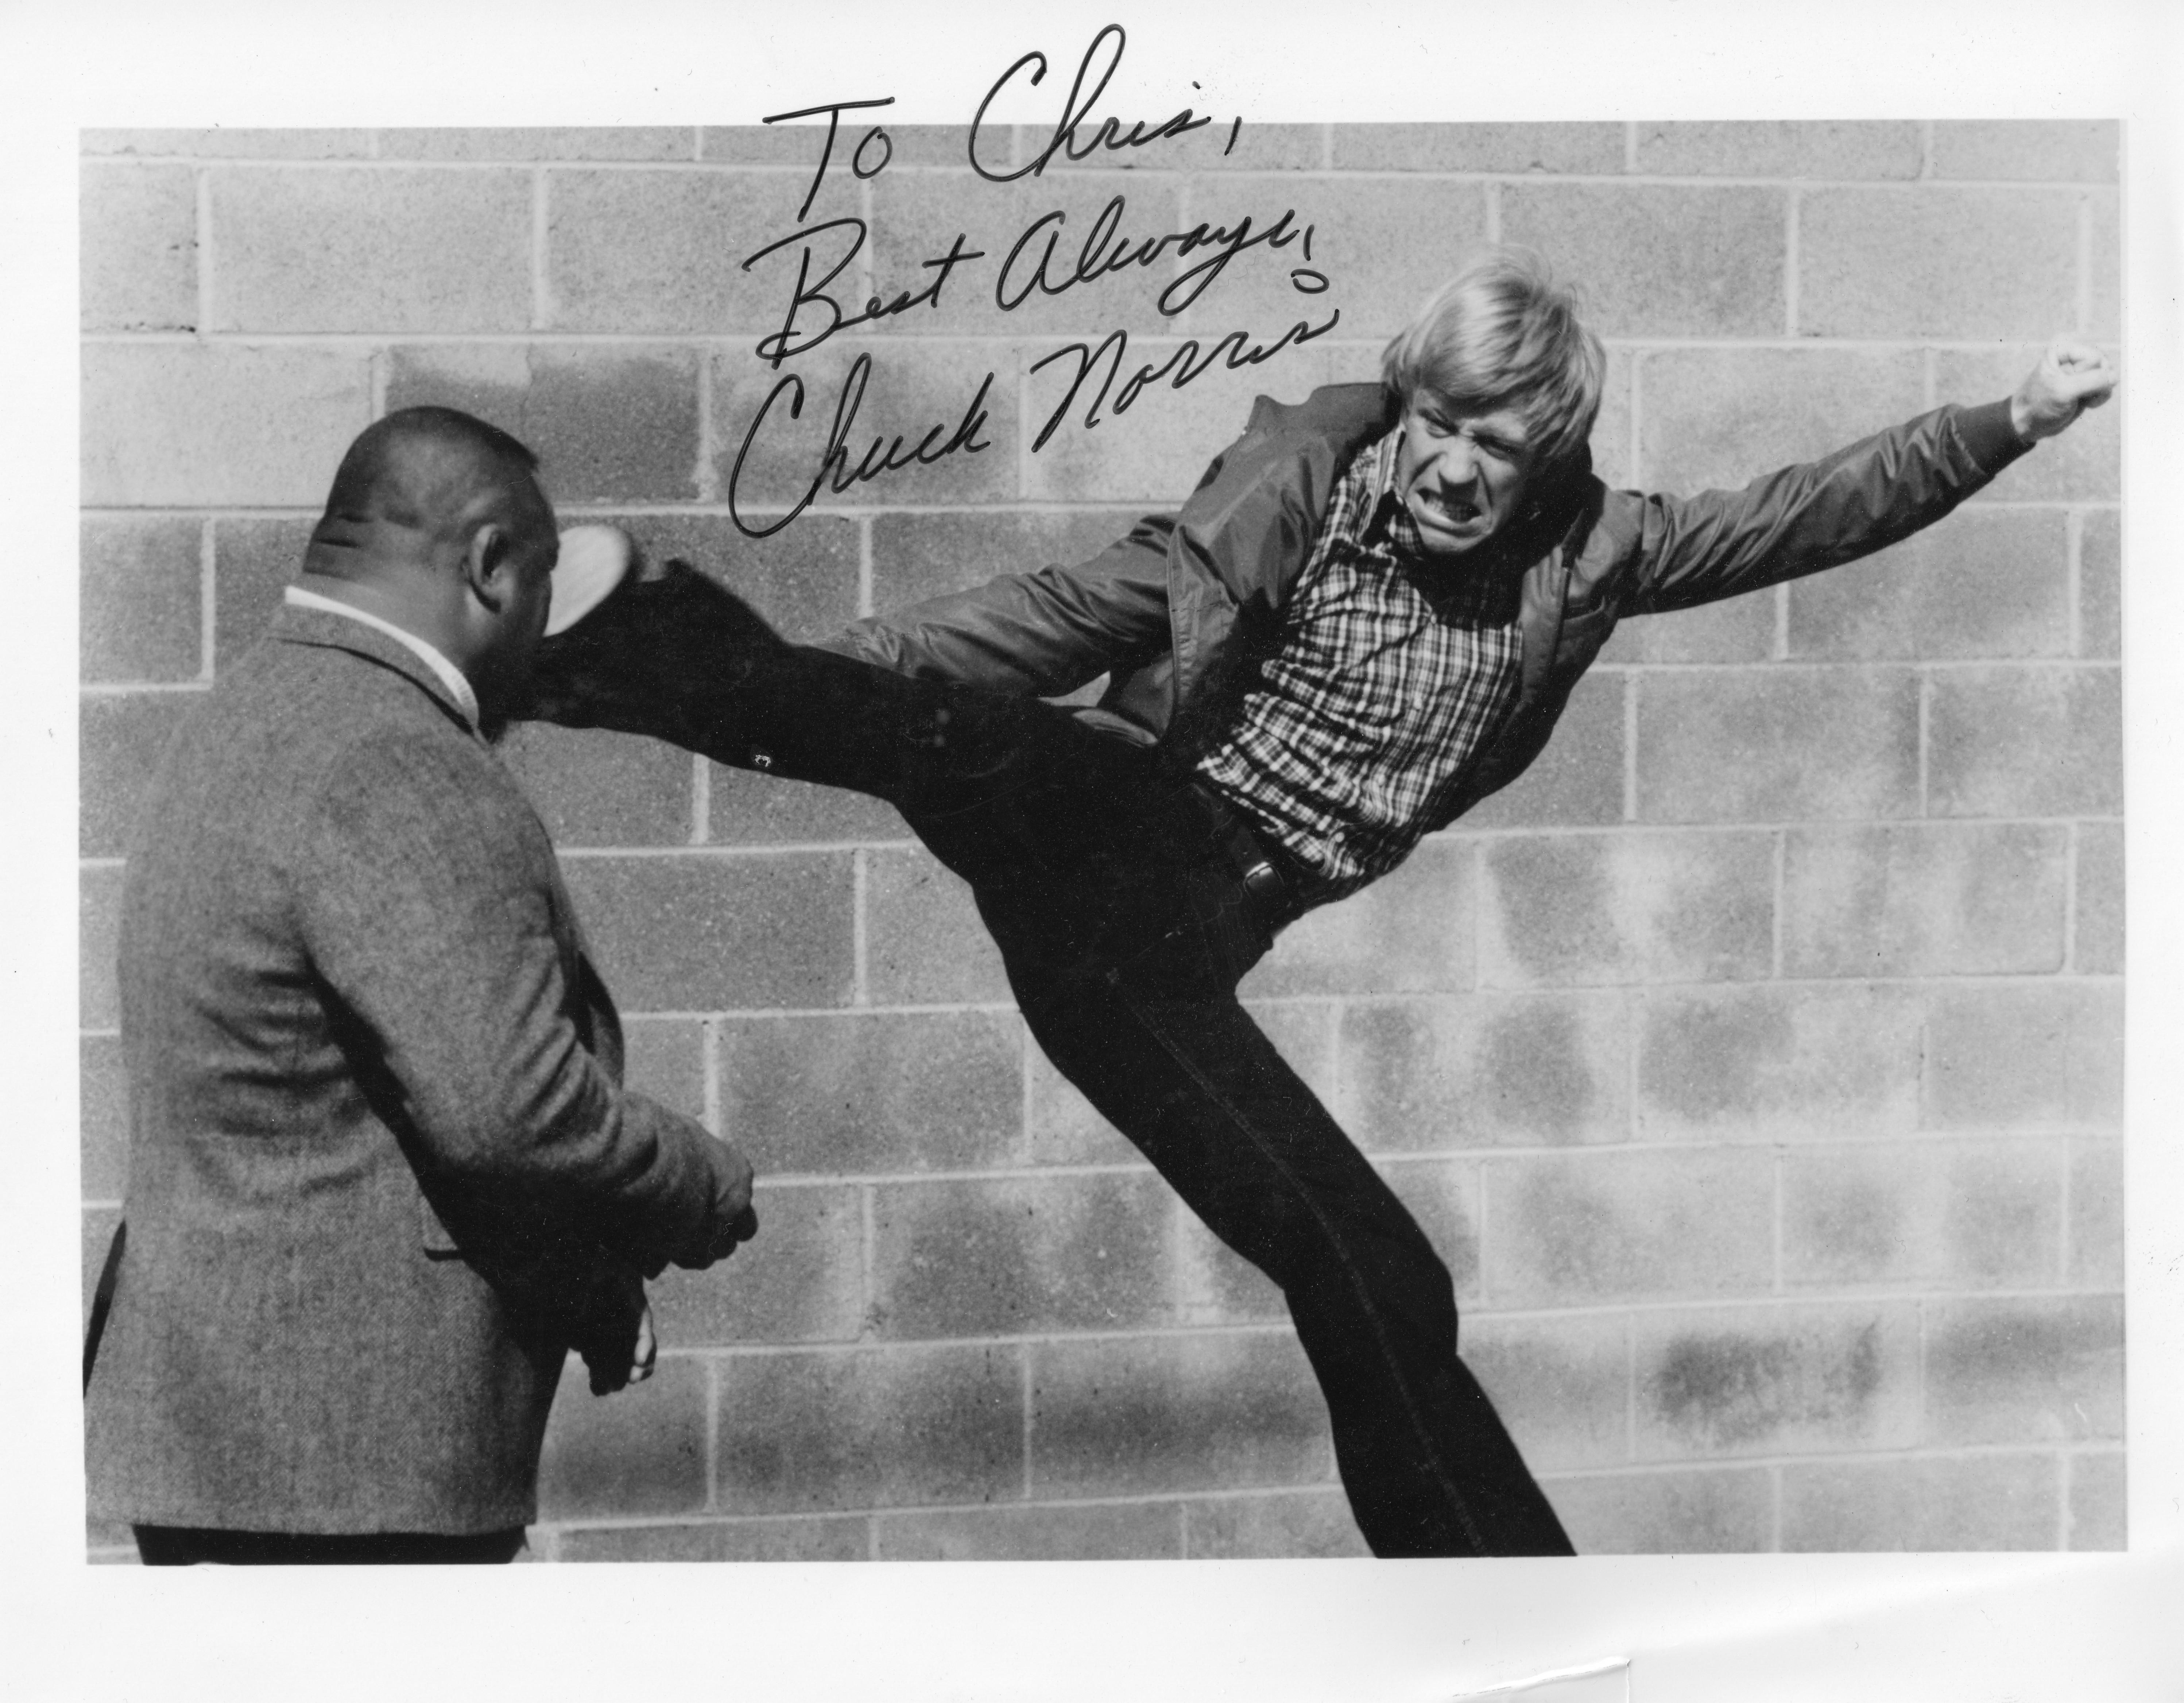 Chuck-Norris-Pic-1001